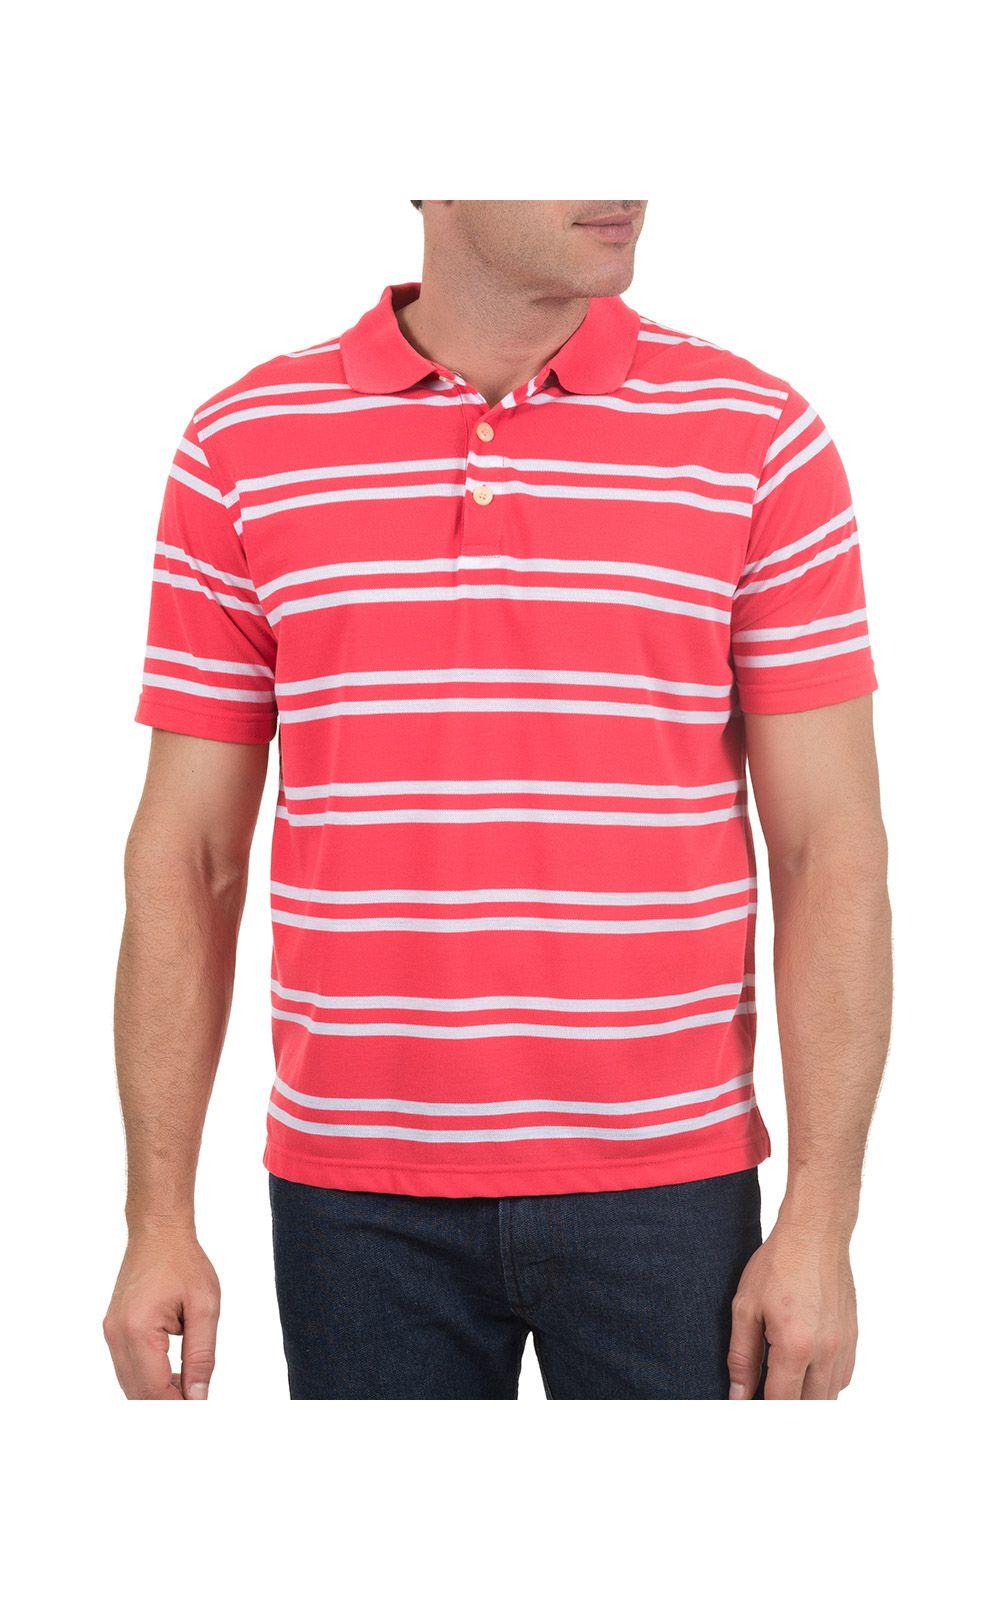 Foto 1 - Camisa Polo Masculina Rosa Listrada